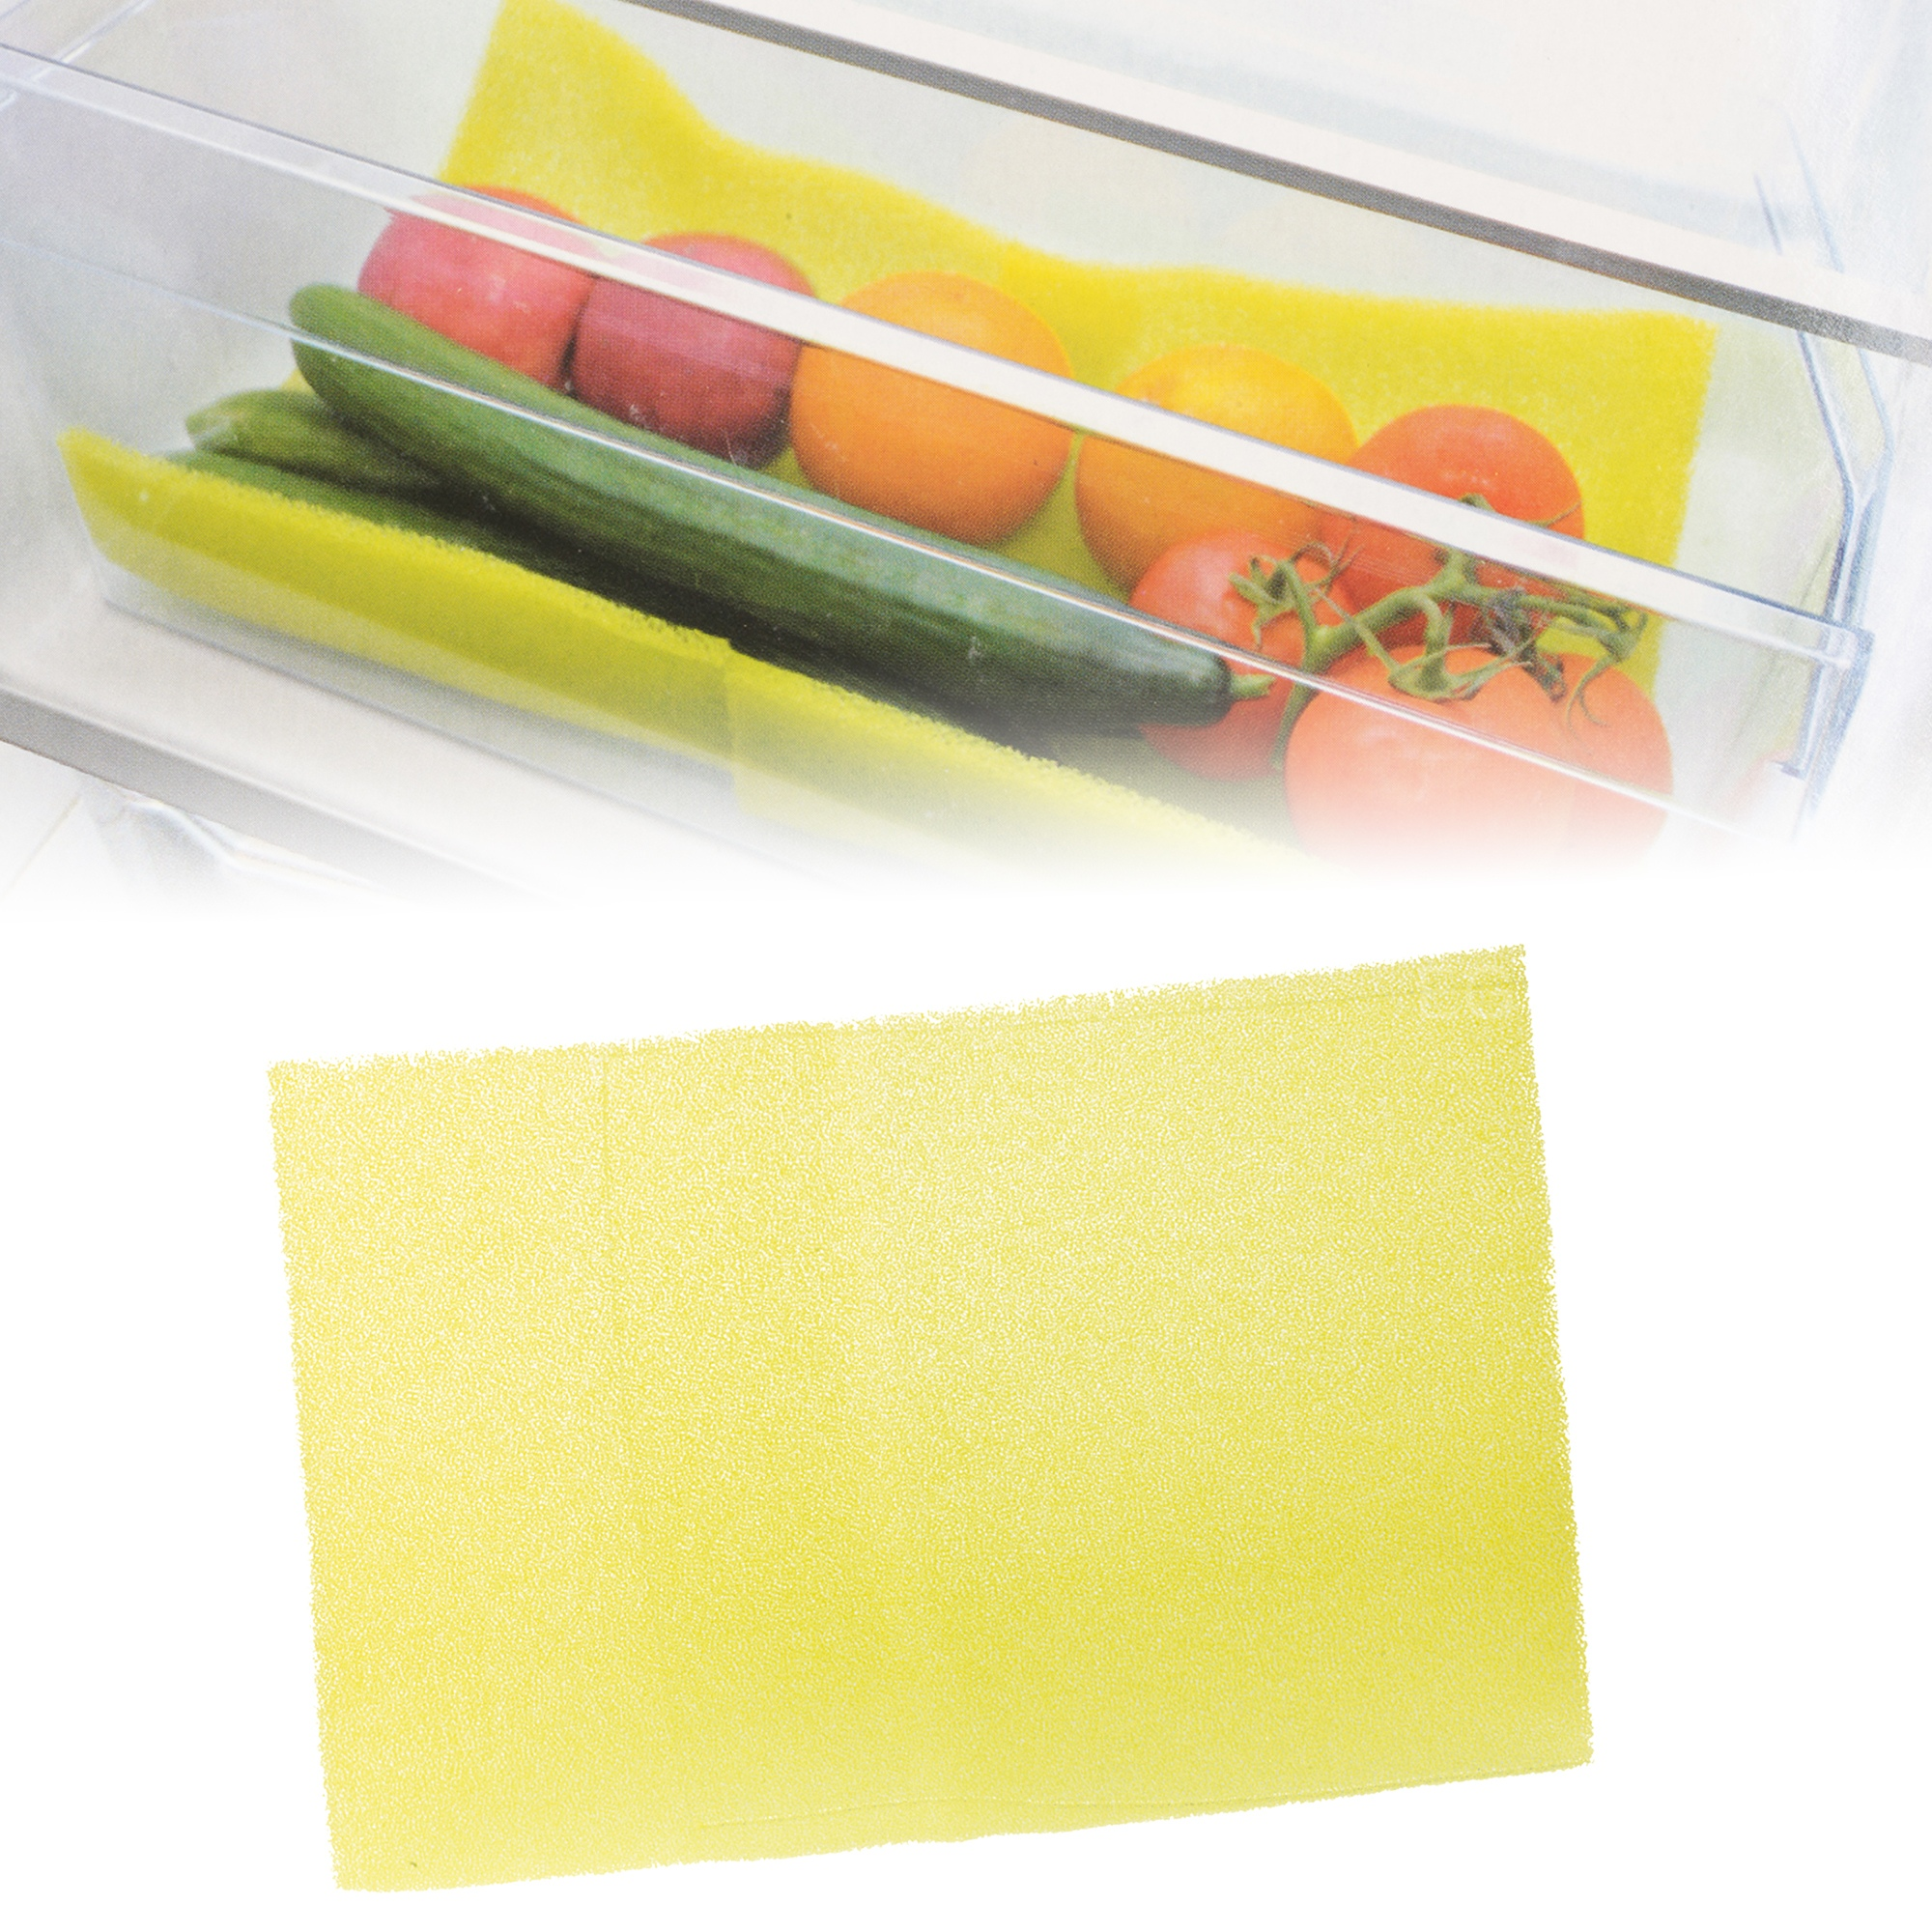 how to keep cut vegetables fresh longer